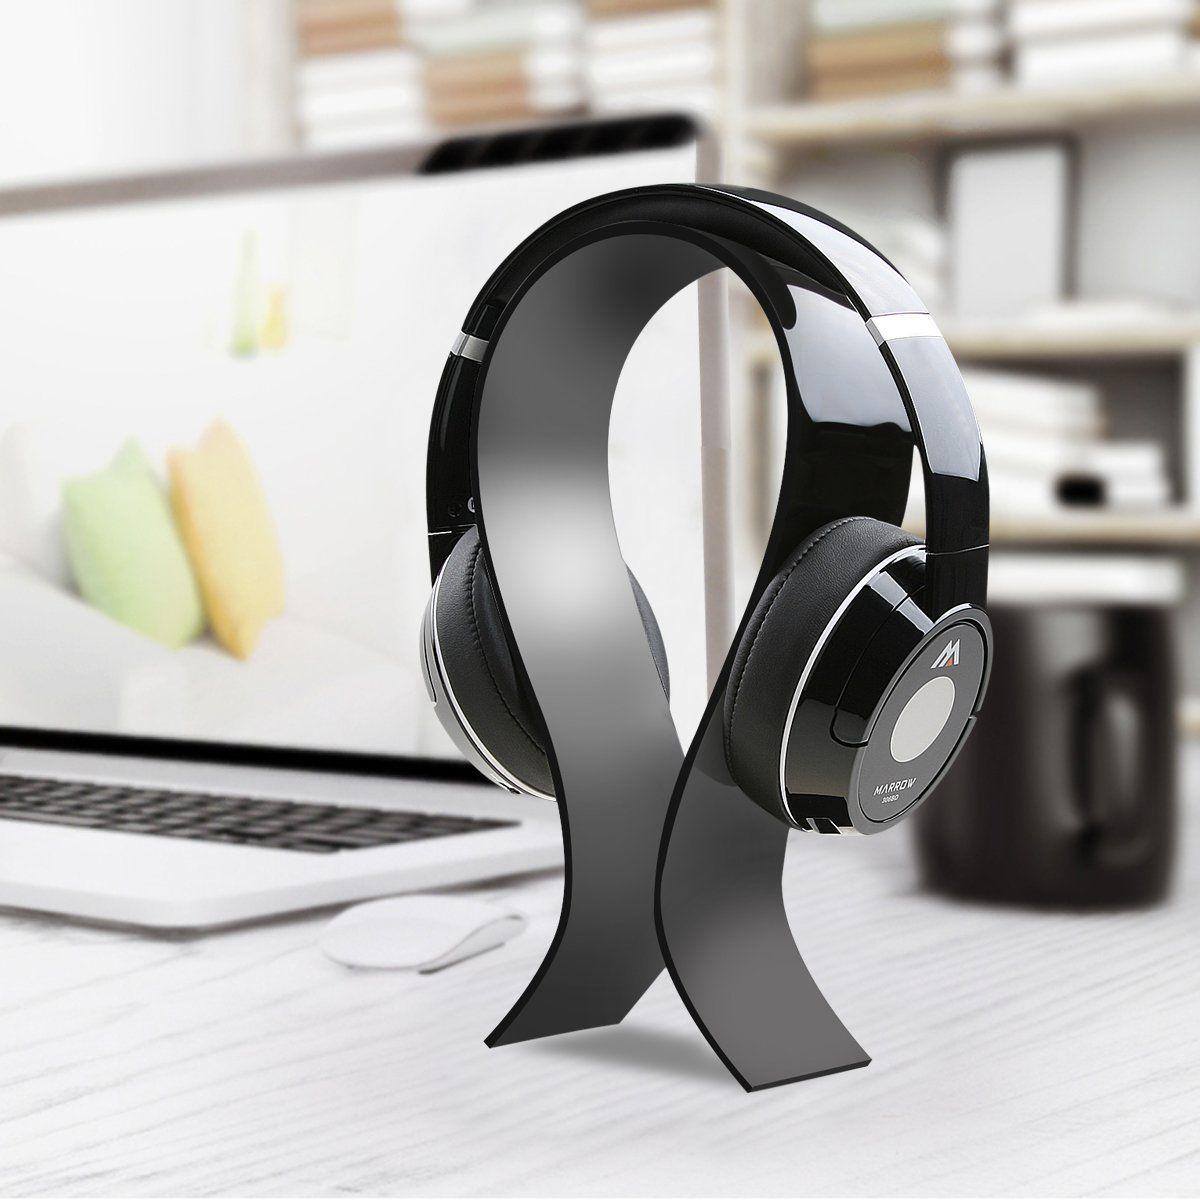 AmoVee Acrylic Headphone Stand Black Cell Phones